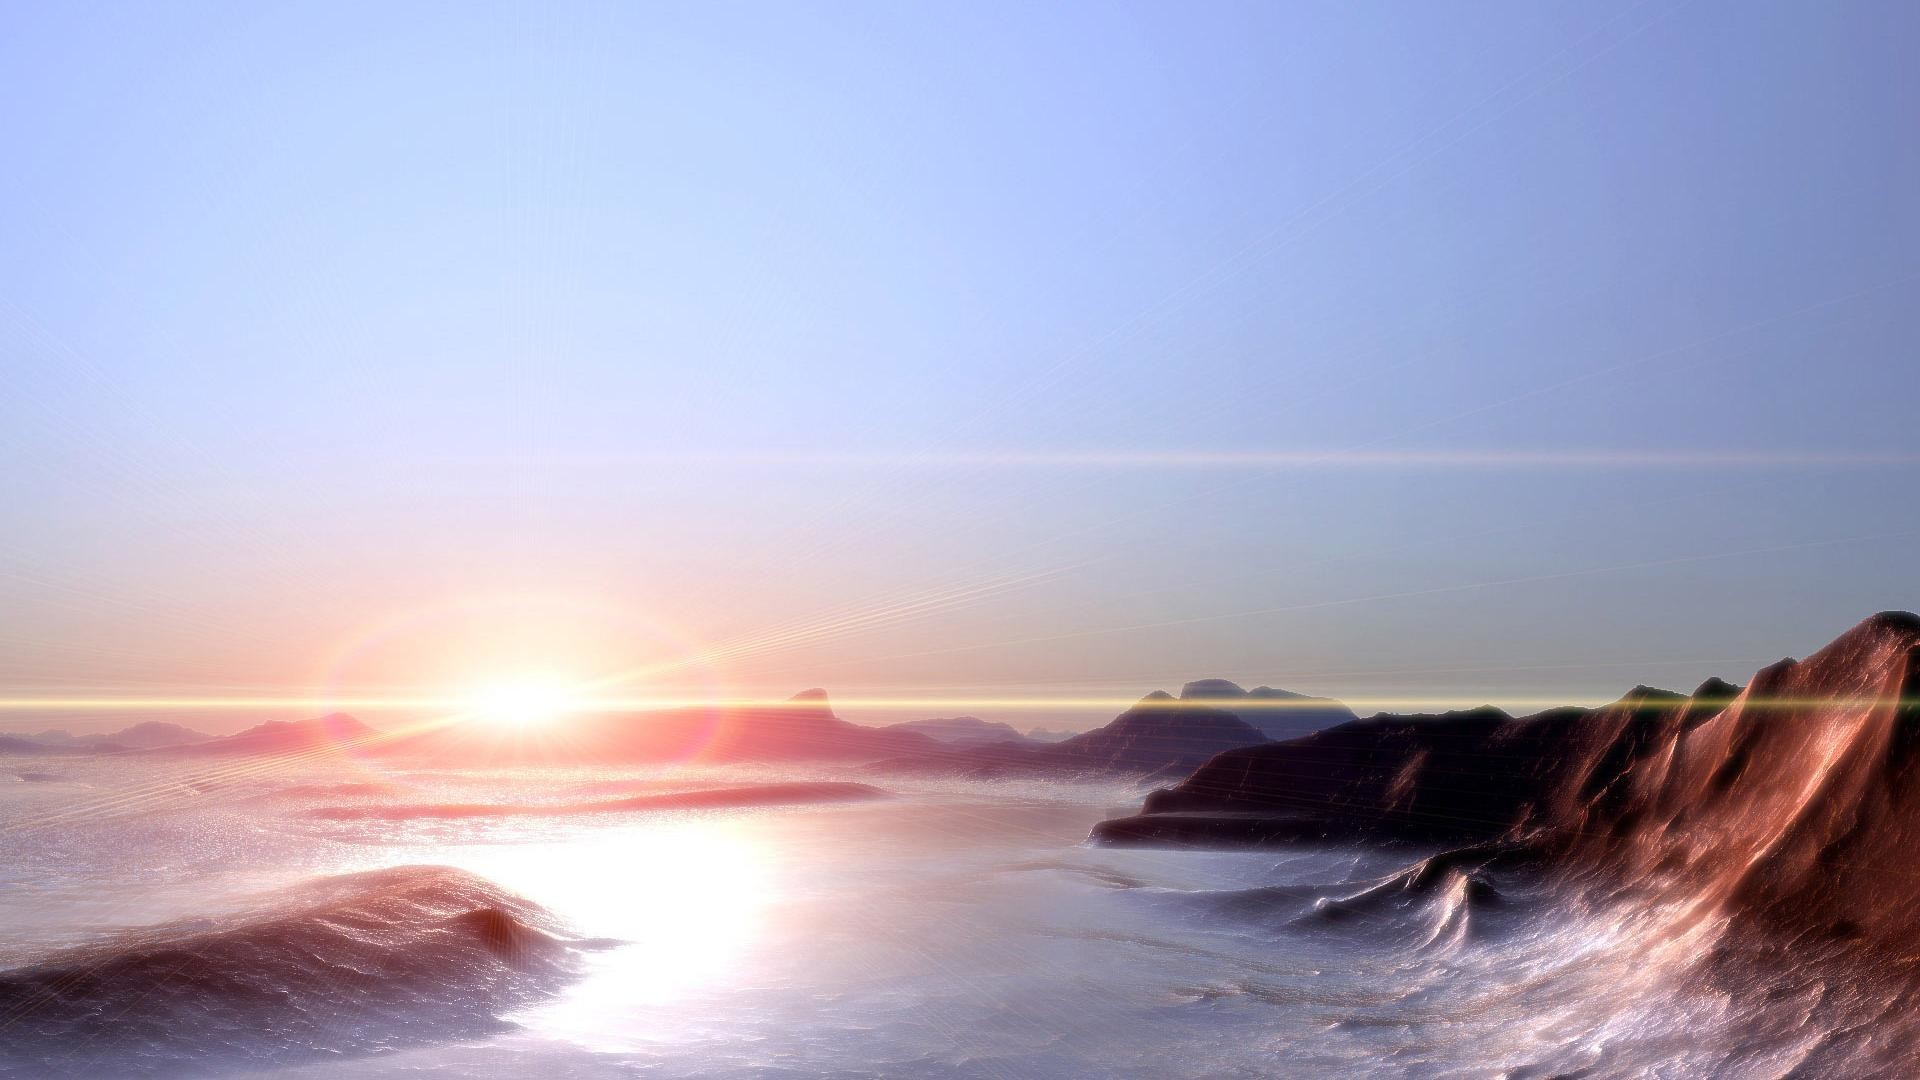 1920x10801440x9001280x800 · beautiful sunset and hills sea scenery  backgrounds